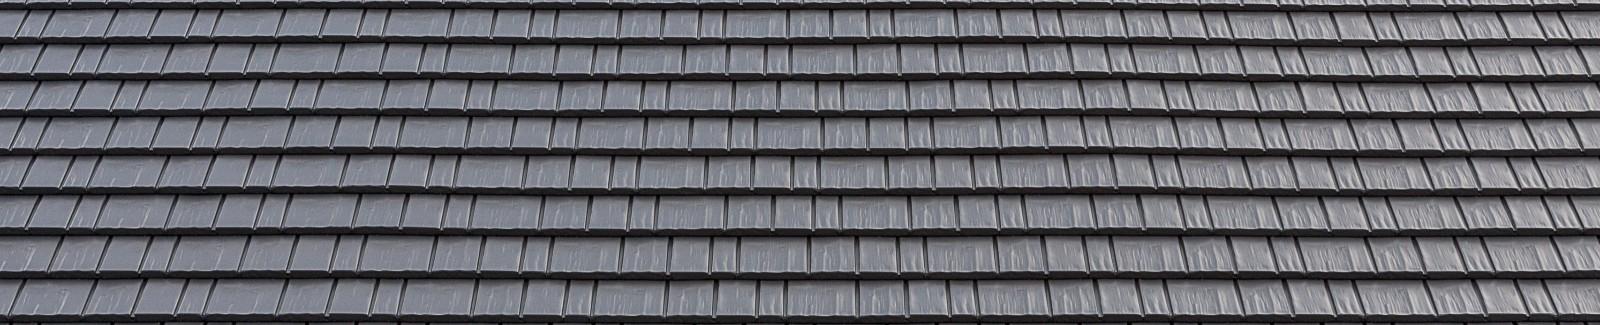 Cedar shake aluminum roofing